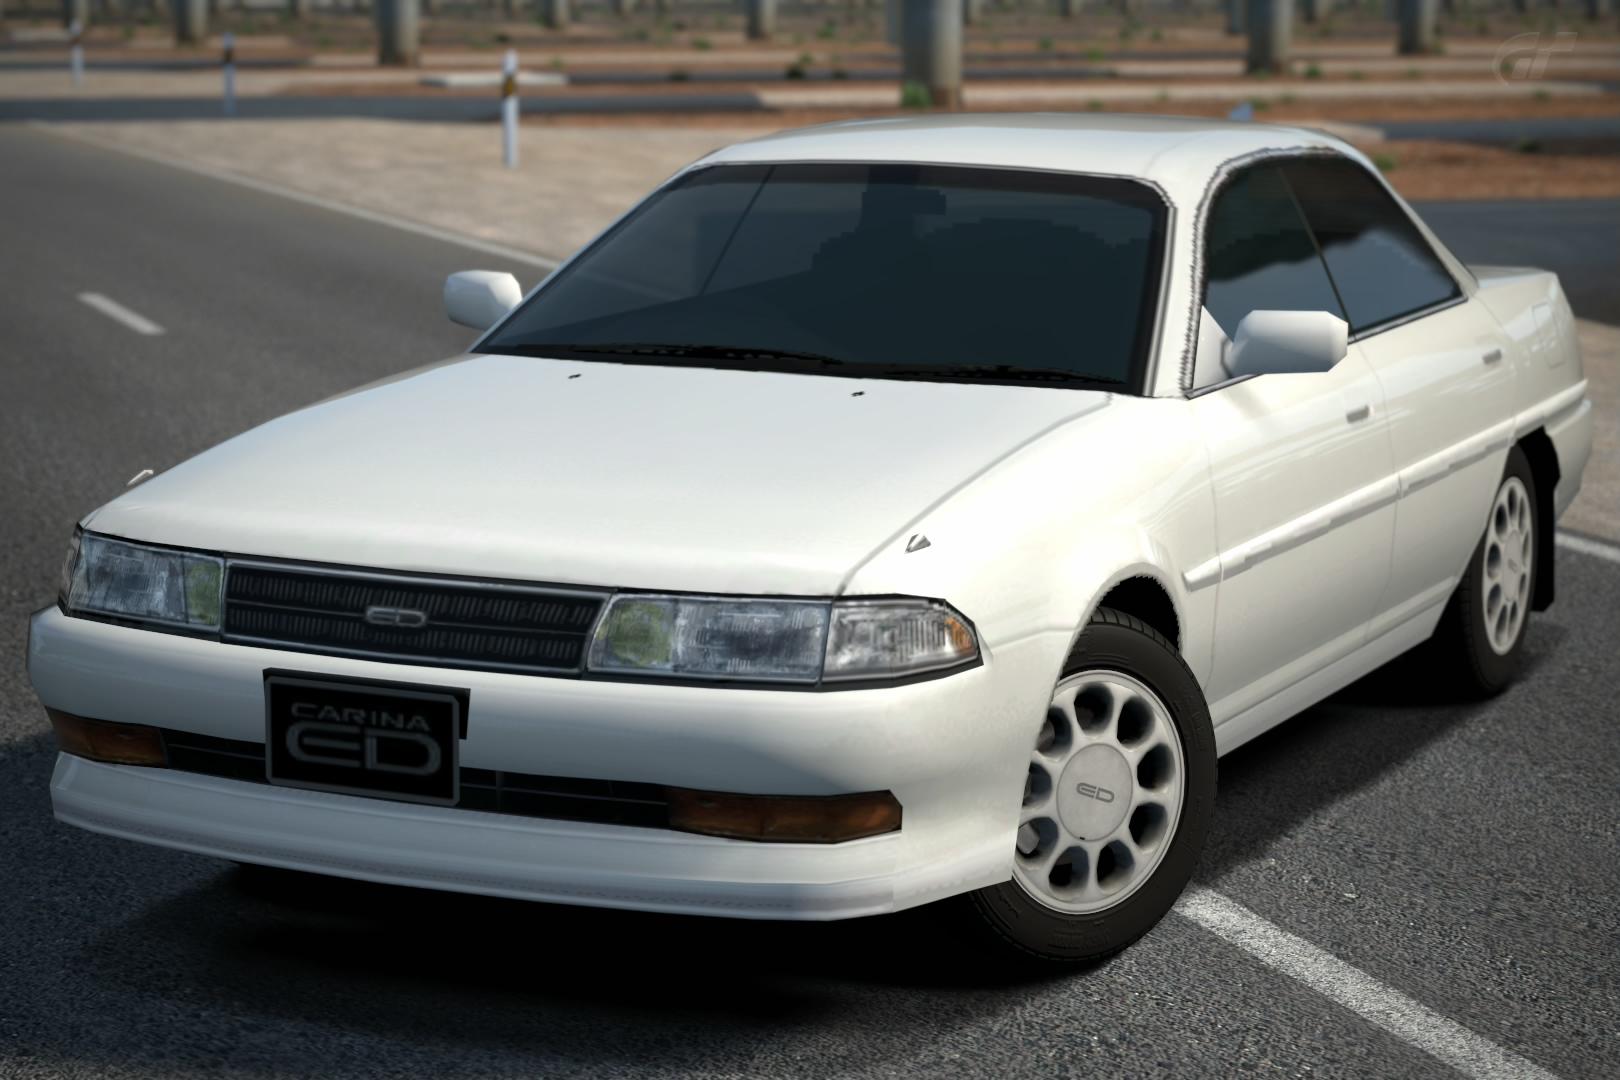 Toyota Carina Ed 2 0 X 4ws 89